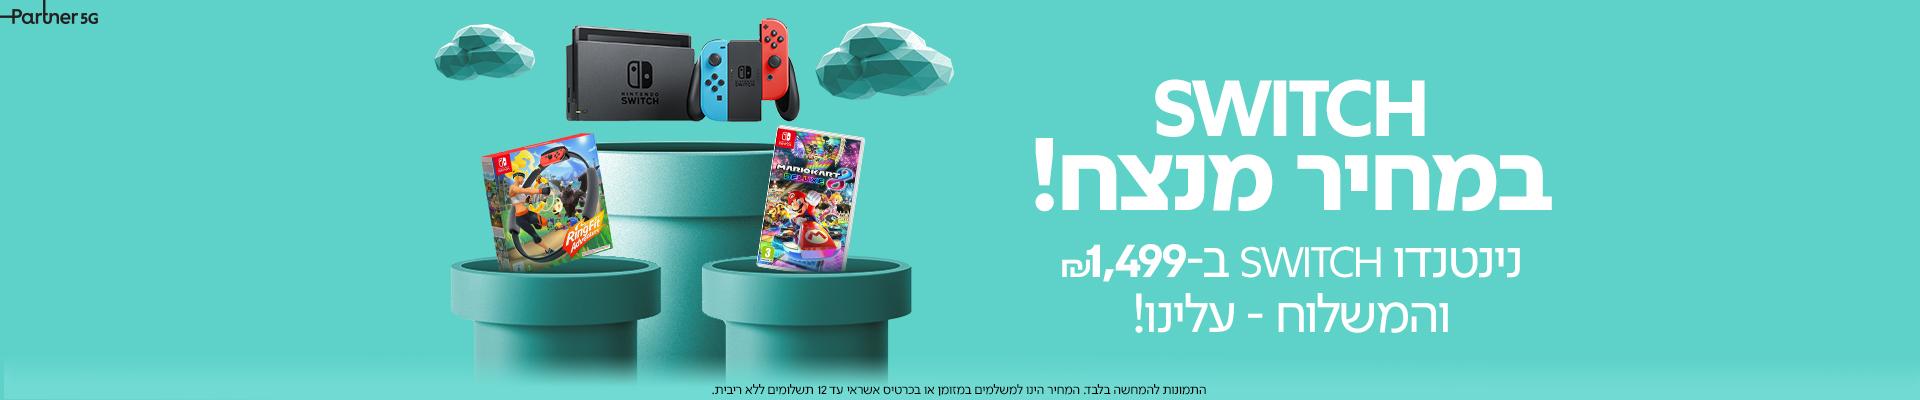 Nintendo Switch Banner (1)